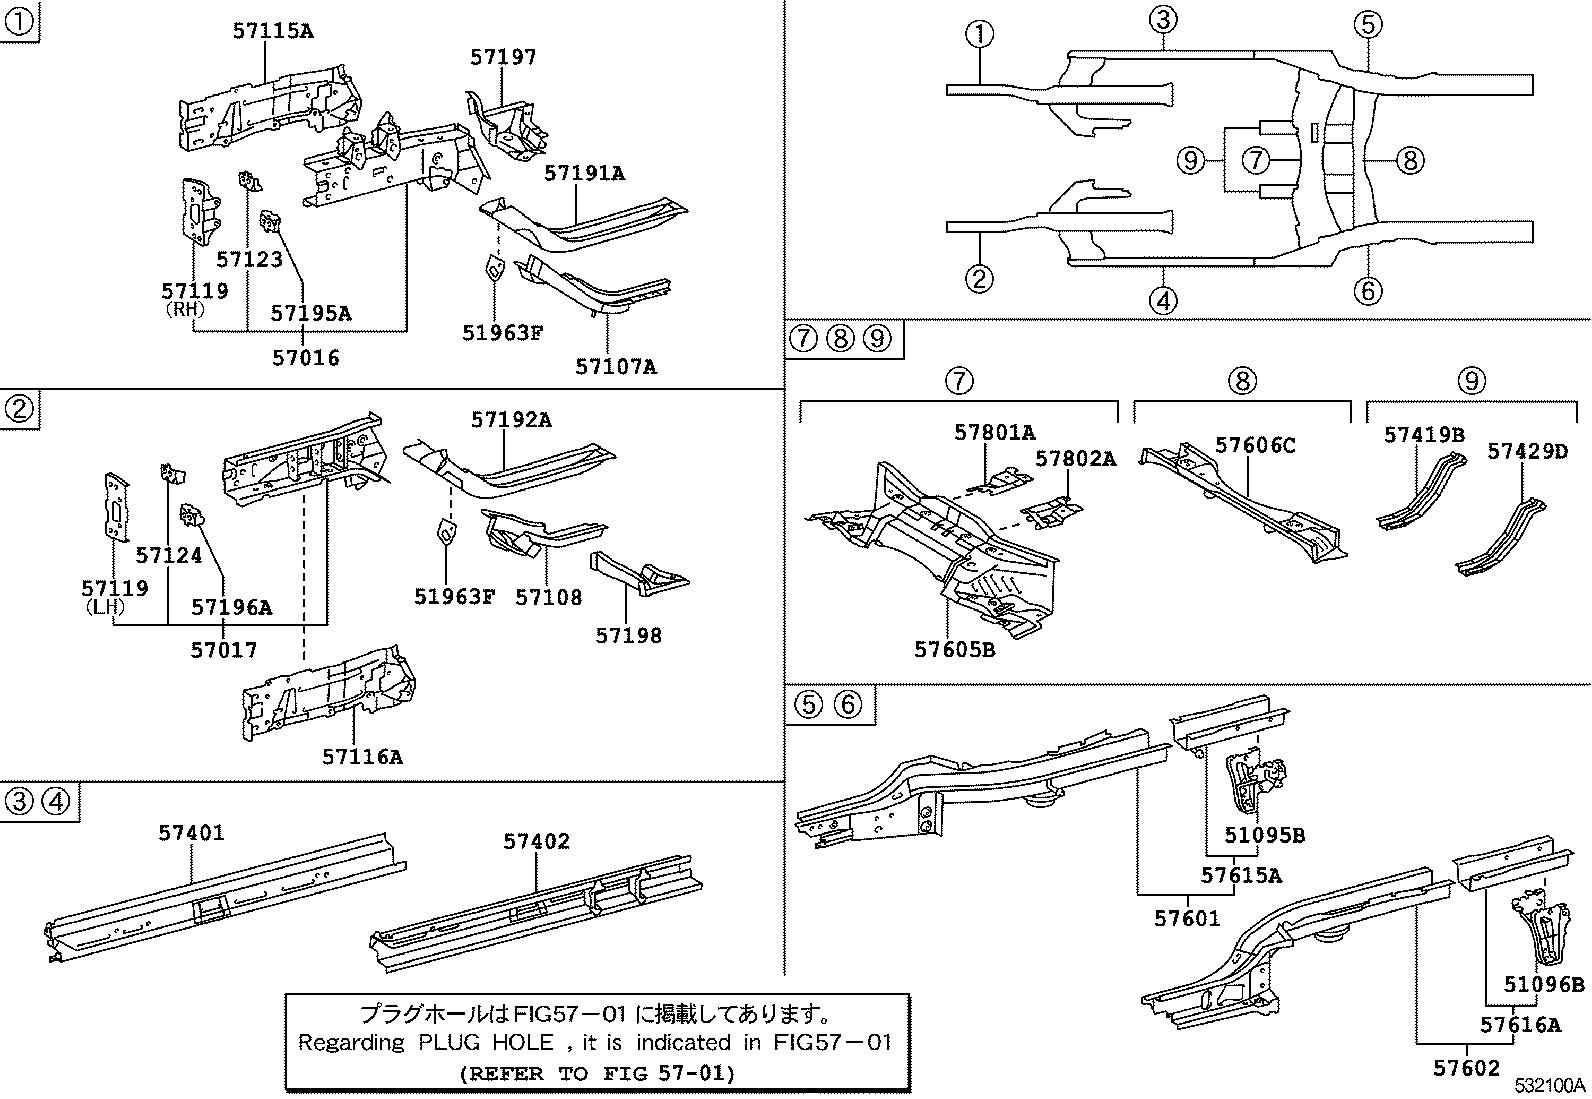 Toyota Belta Scp92 Bexek 141170 Body Group 5305 No1 57616a Car Mitsubishi Minicab U62t Wiring Diagram Parts Accessories Be Forward Auto